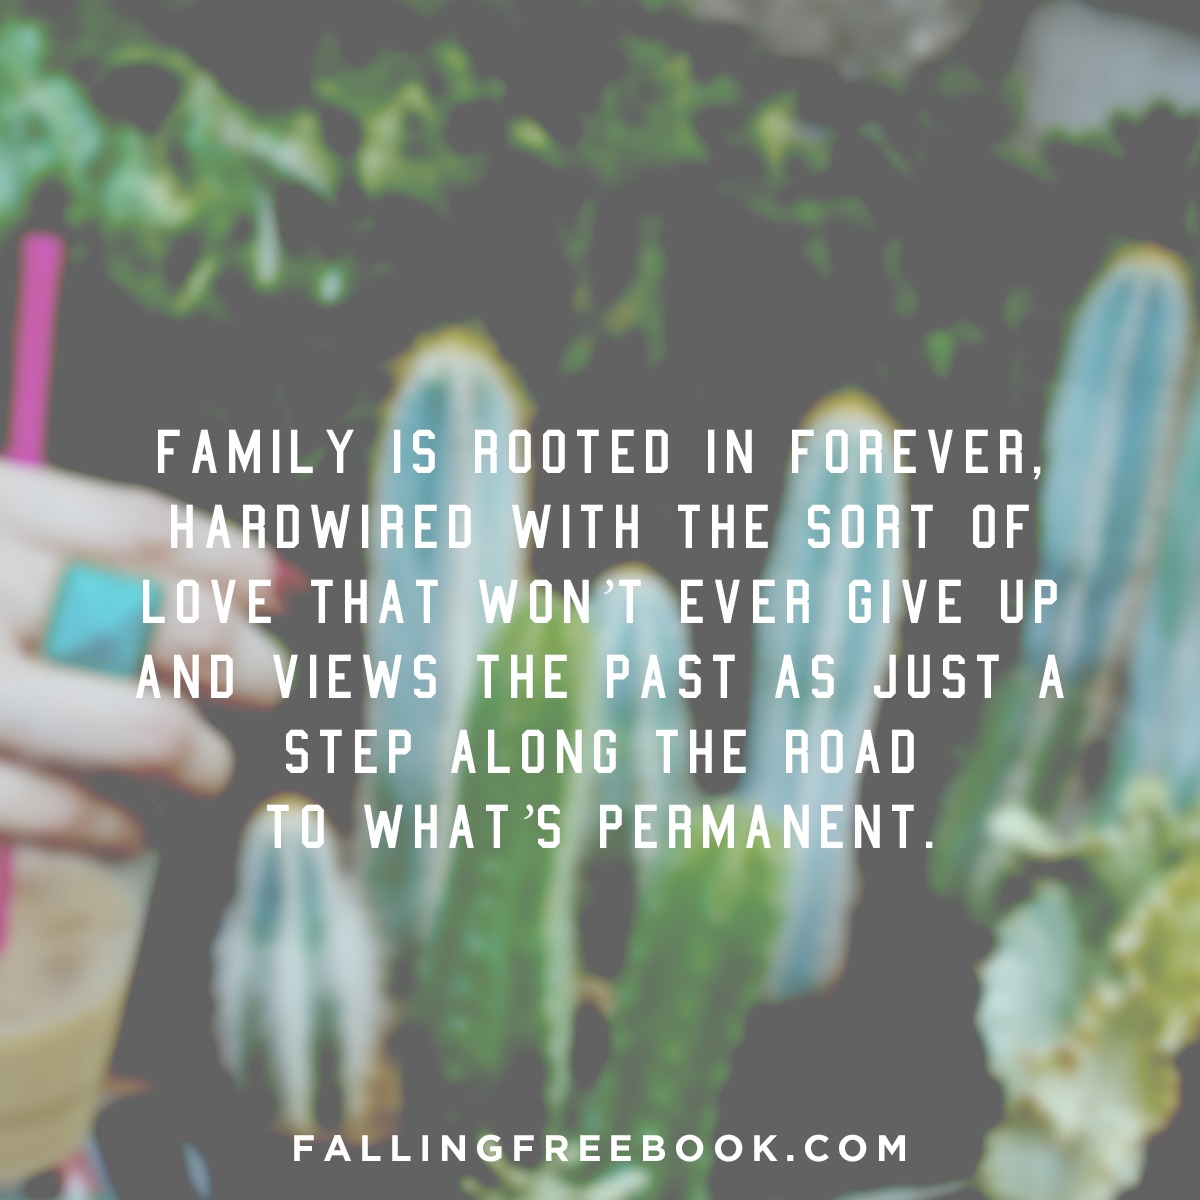 FallingFree_meme_Family.png